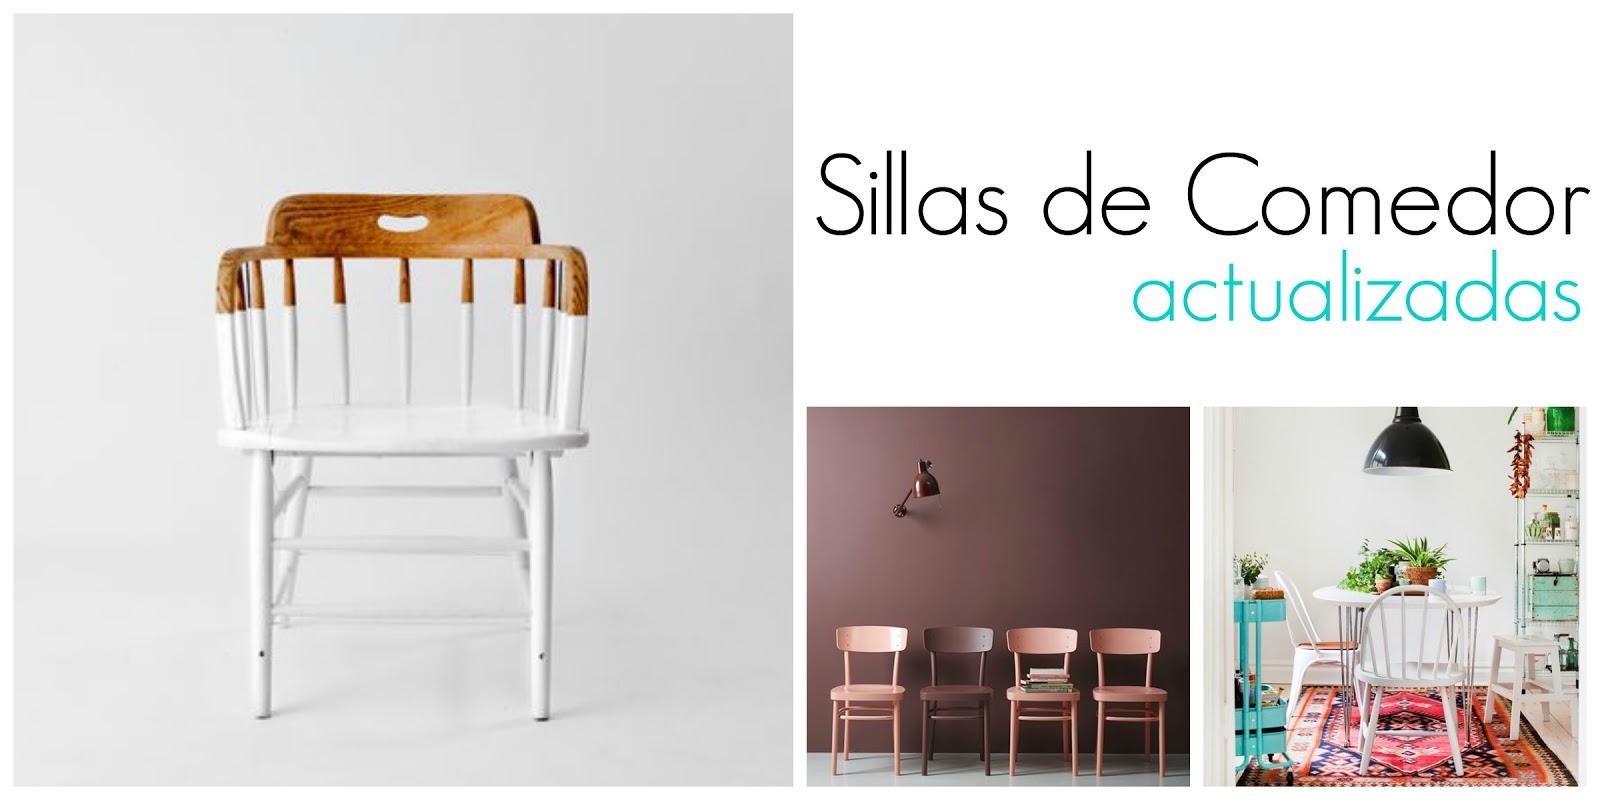 Inspiraci n sillas de comedor actualizadas for Sillas comedor 2016